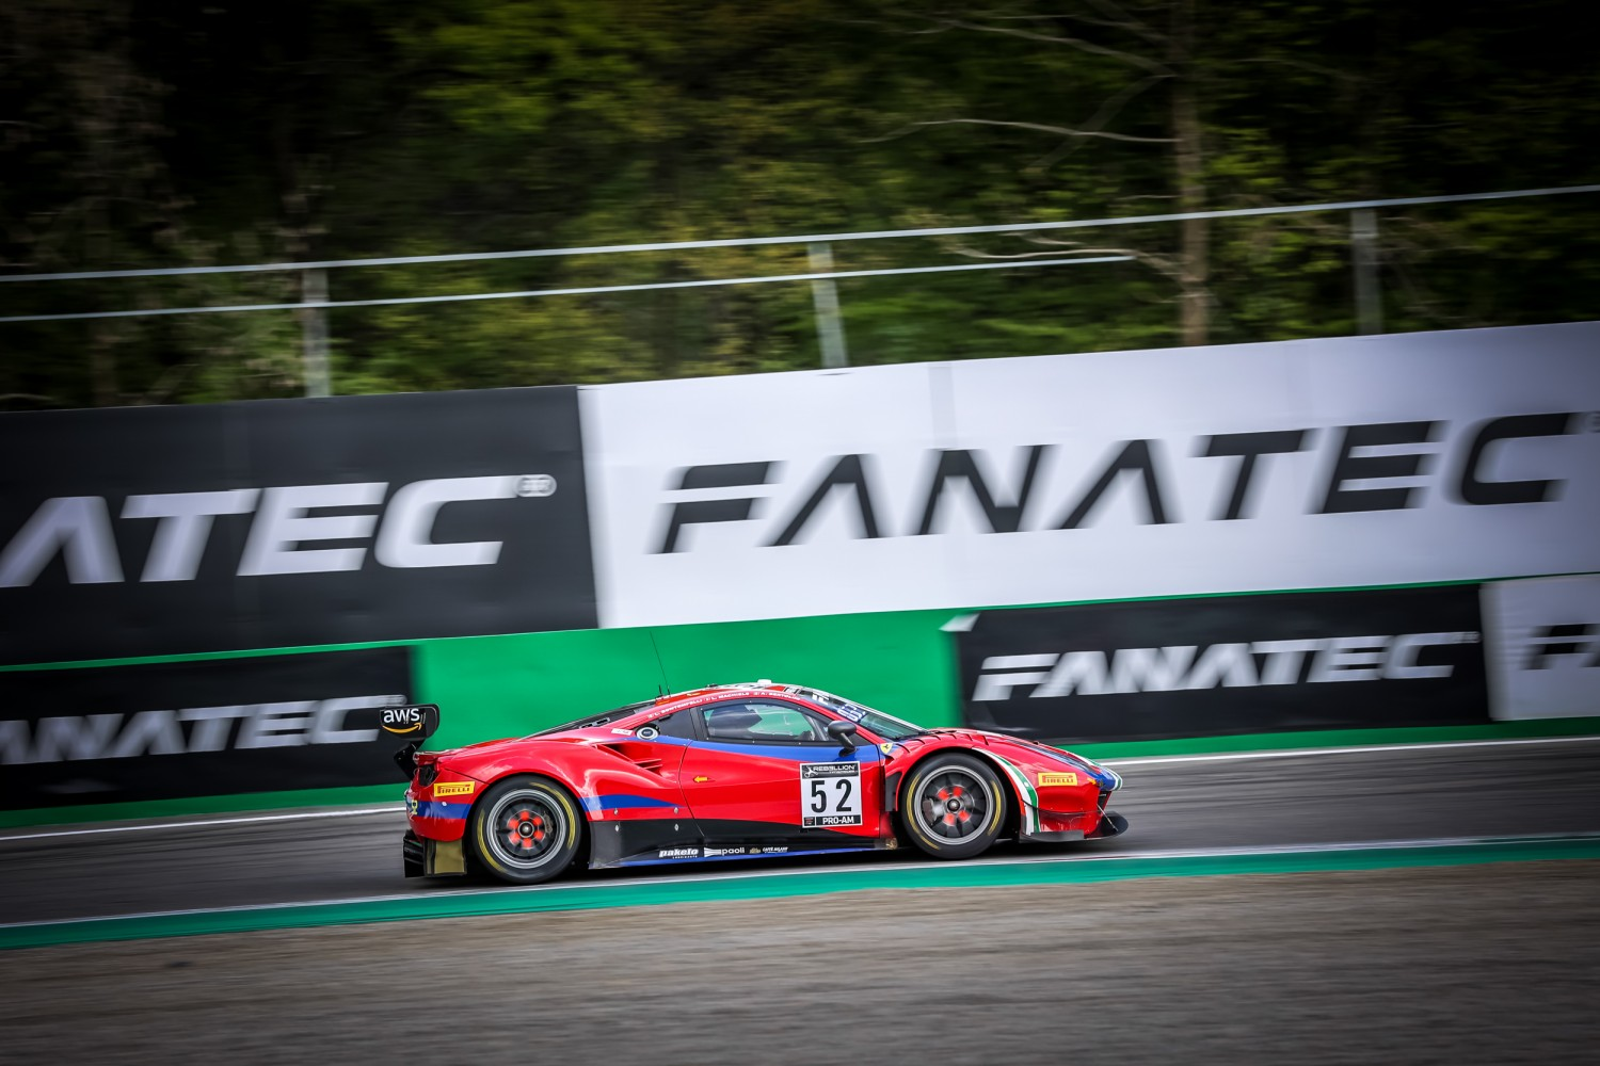 AF Corse Ferrari begins 2021 on top as Bontempelli leads Bronze Test at Monza